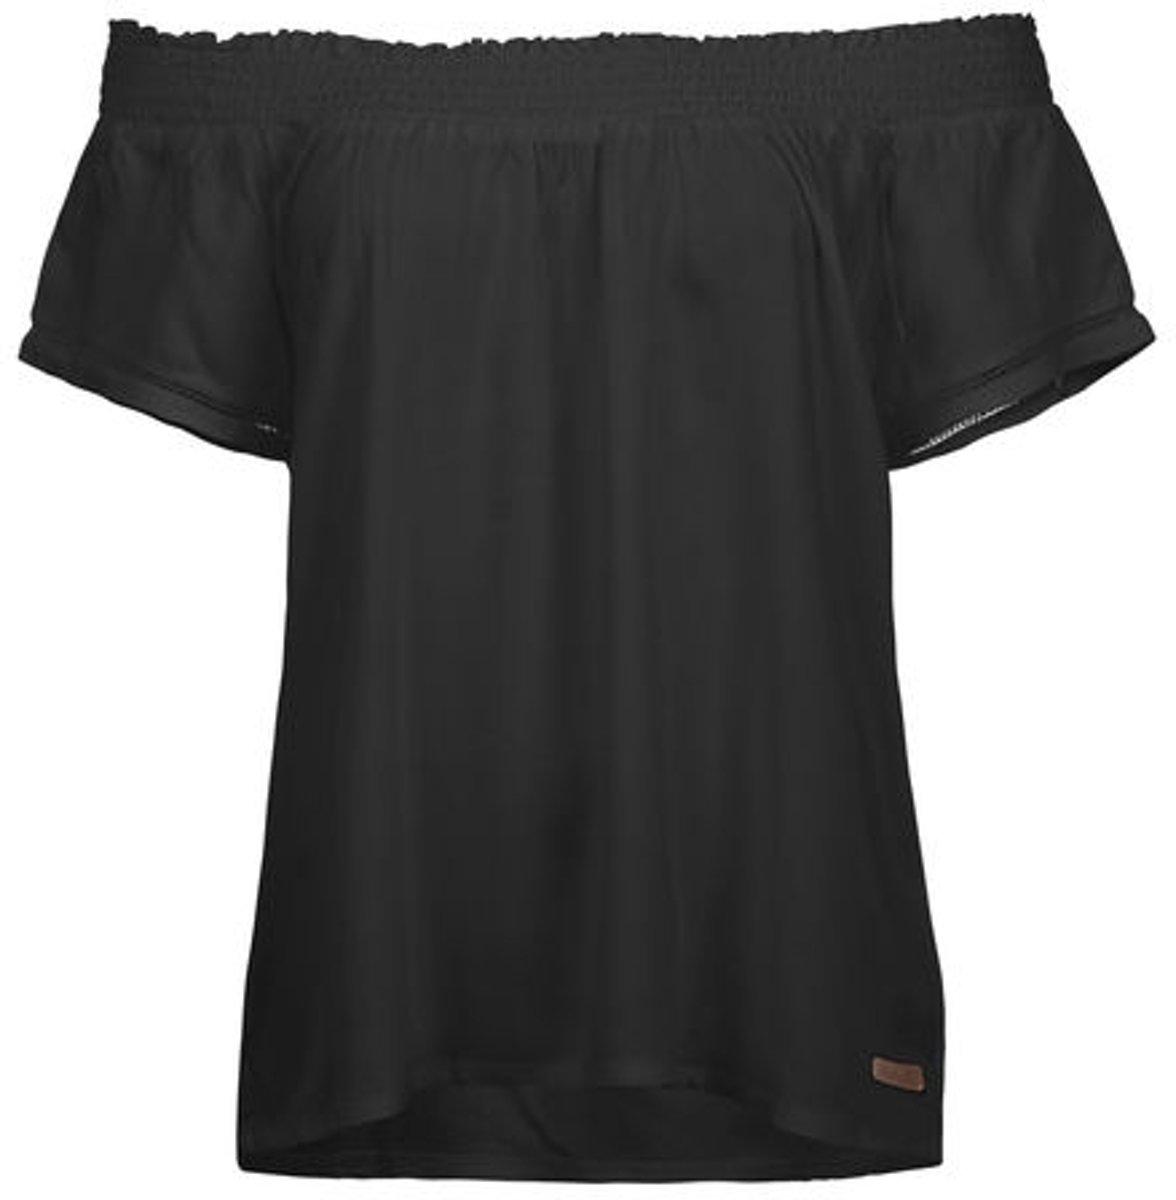 Protest murielle blouse murielle thumbnail